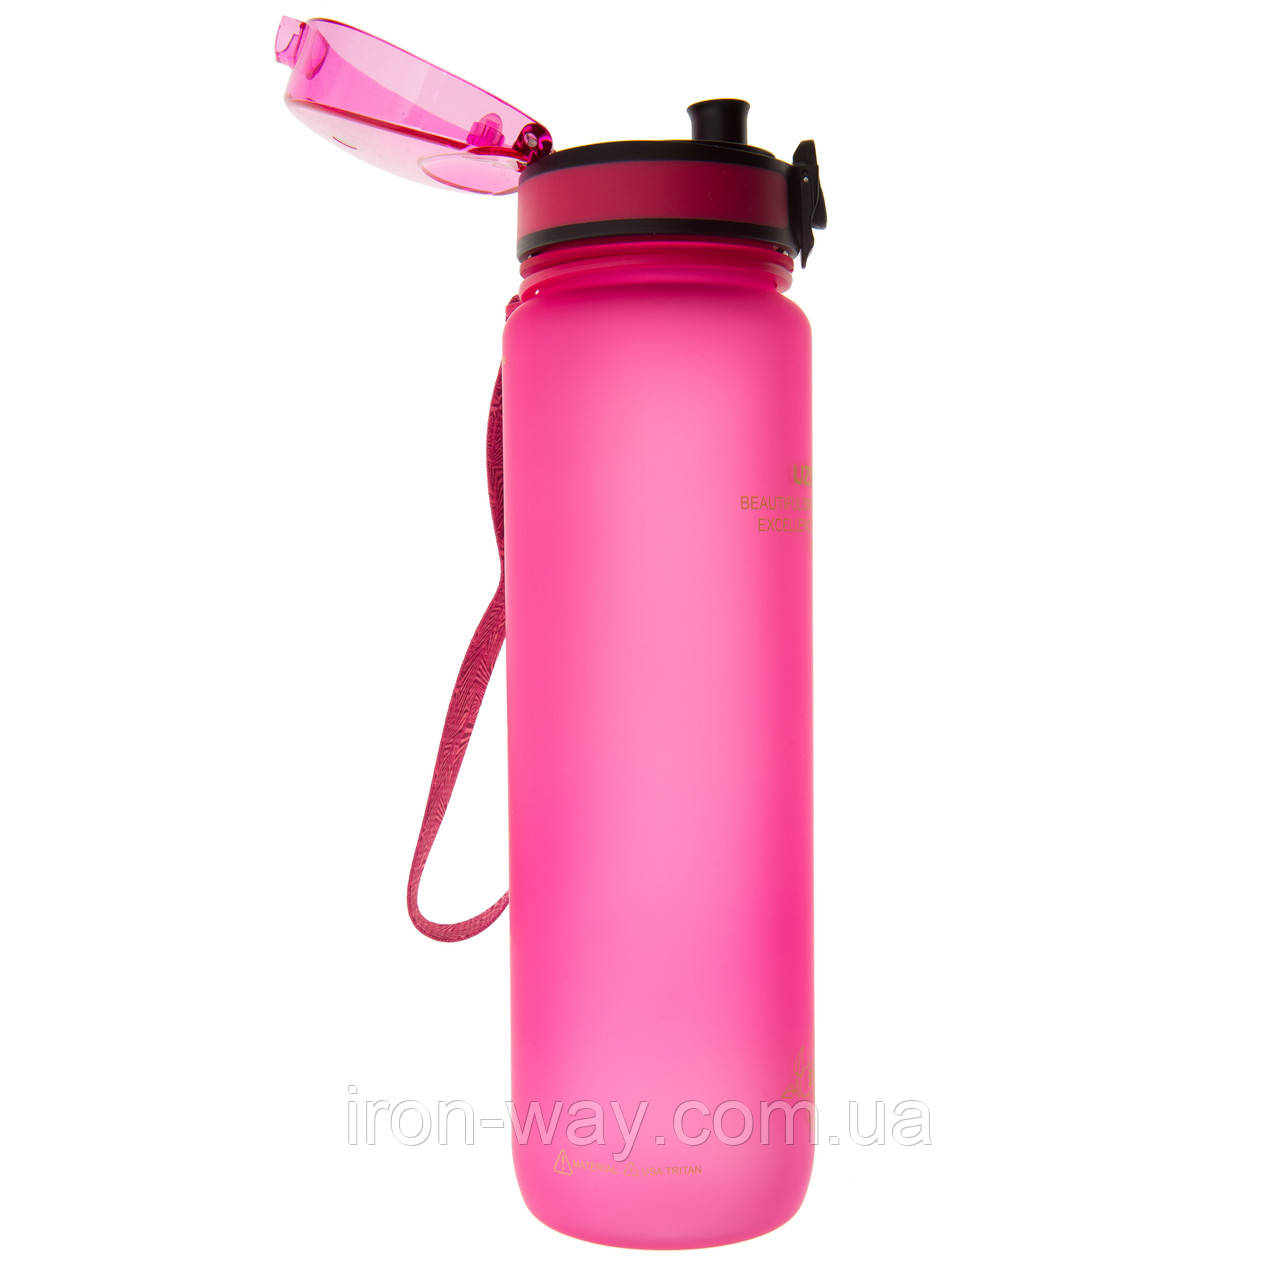 Бутылка для воды Uzspace Colorful Frosted-Tritan 1000 мл Розовый 3038